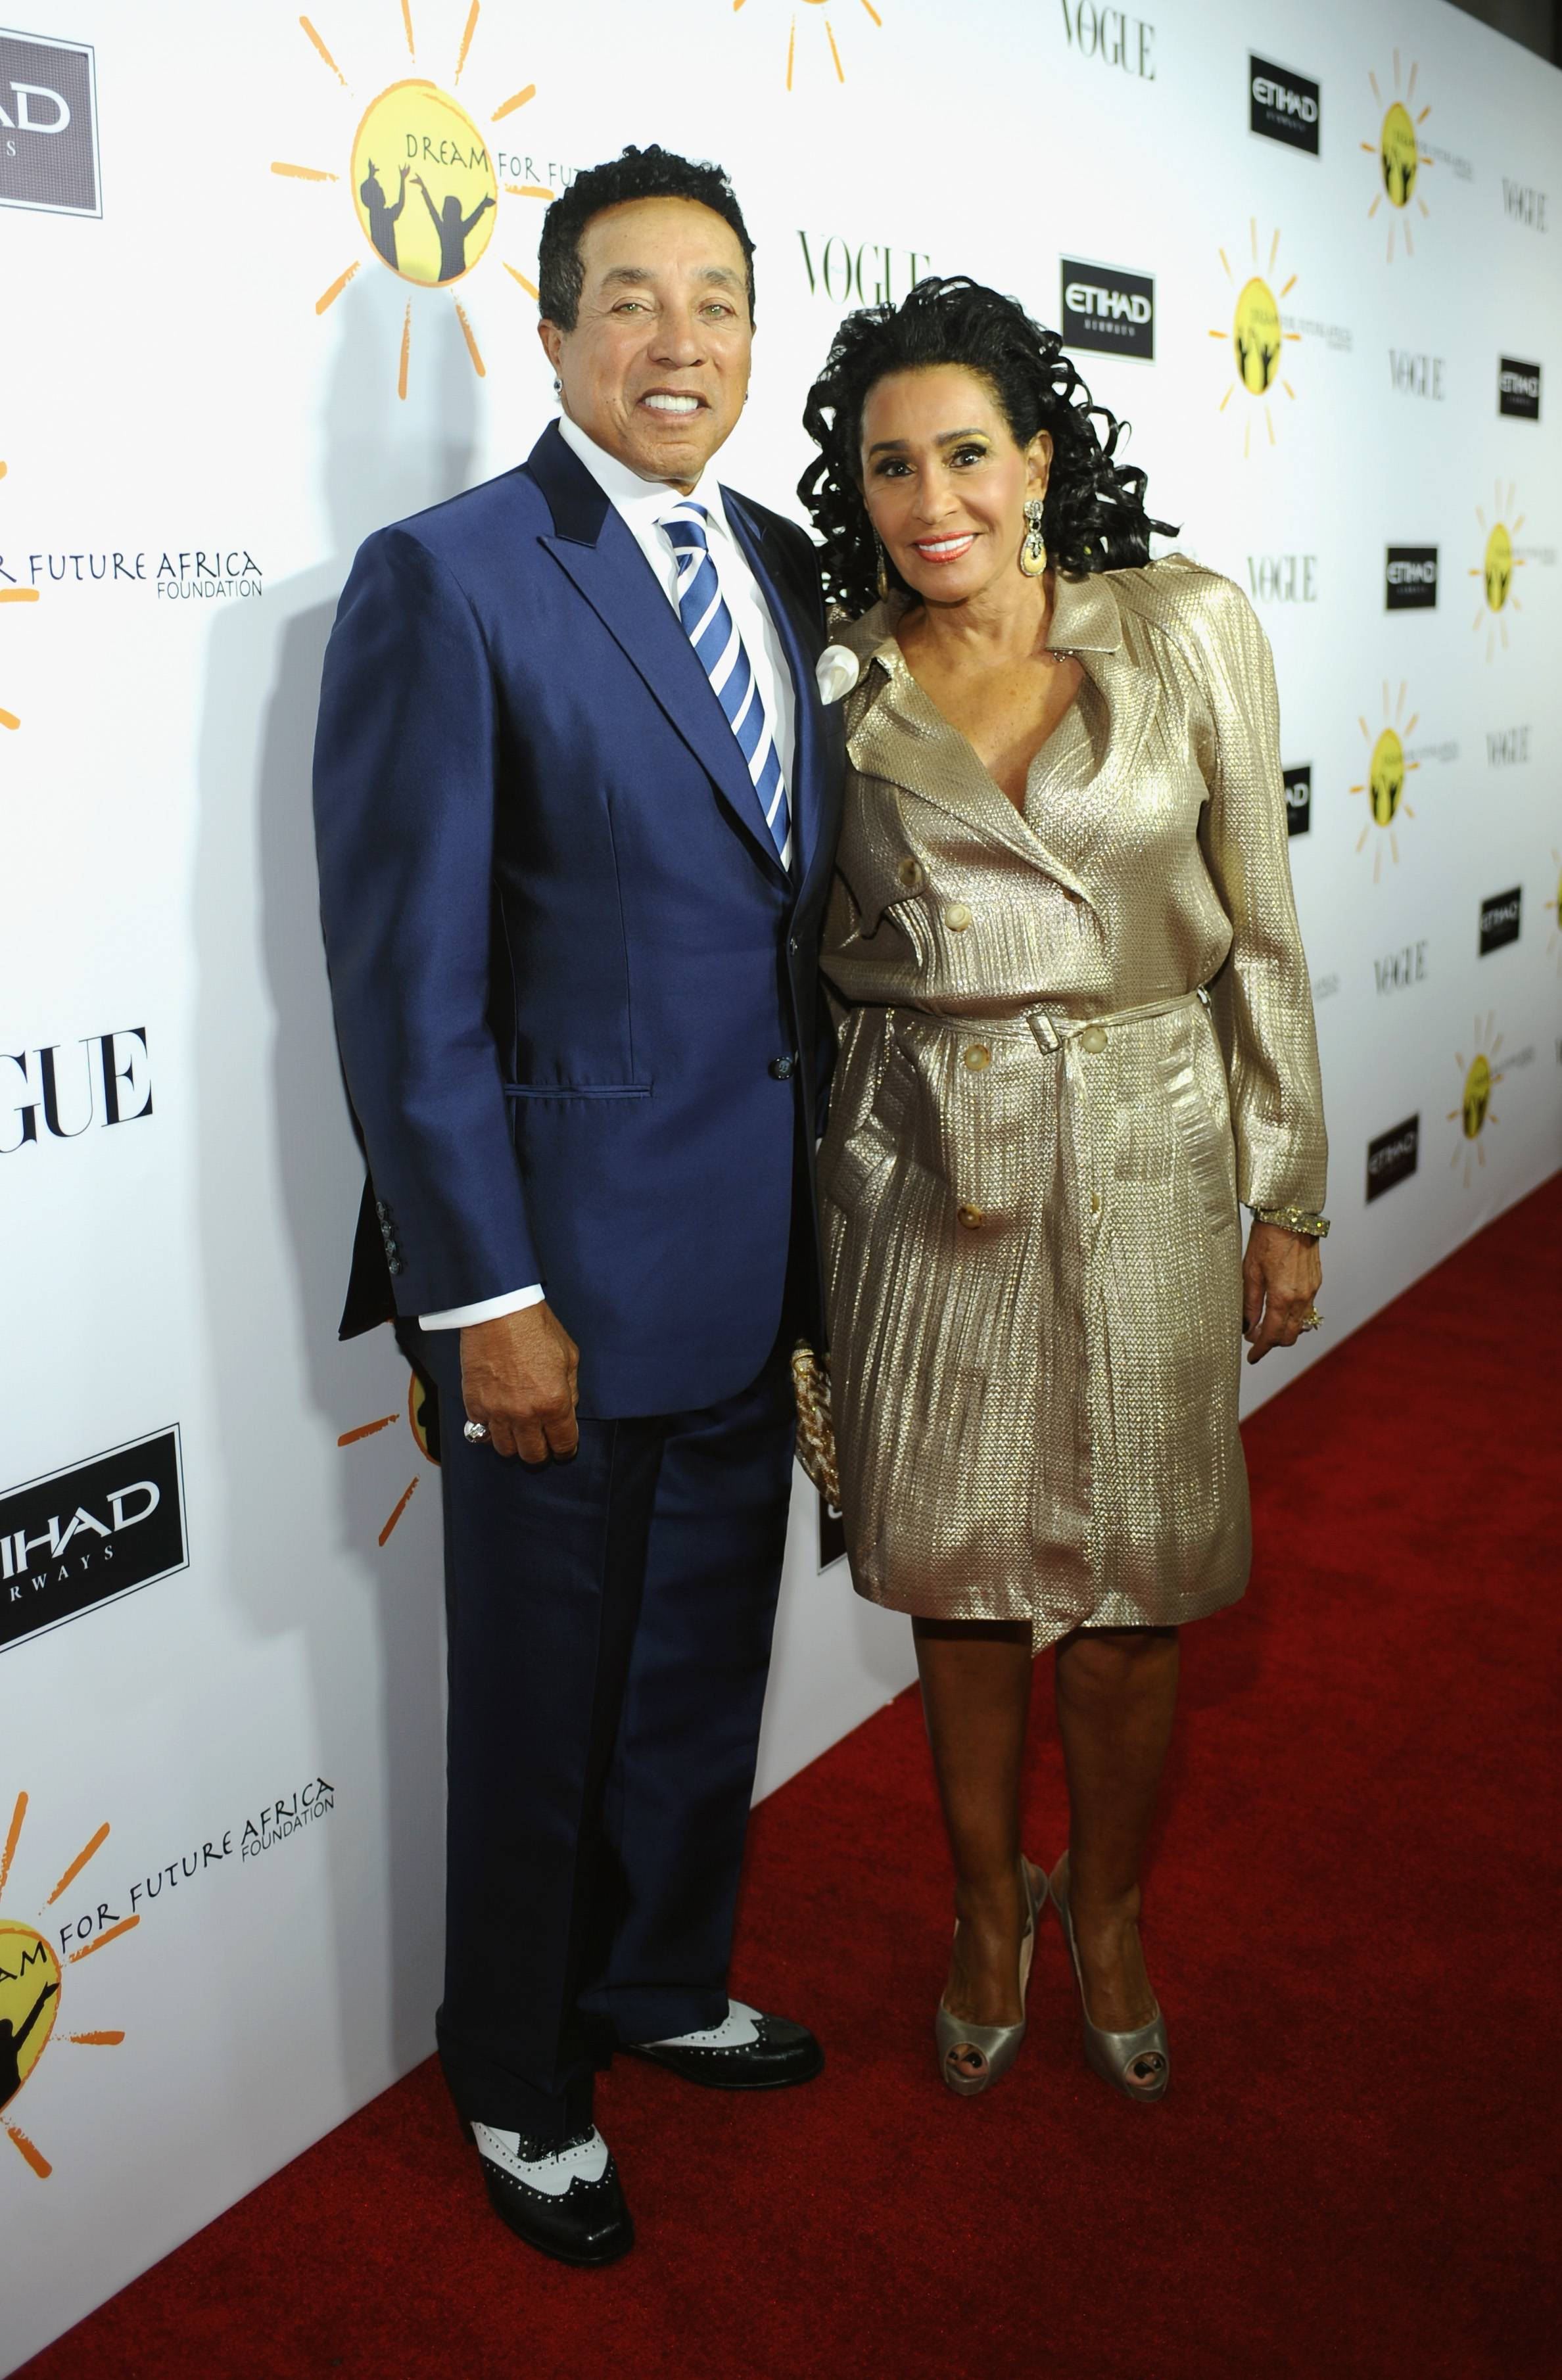 Dream For Future Africa Foundation Inaugural Gala Honoring Franca Sozzani Of VOGUE Italia